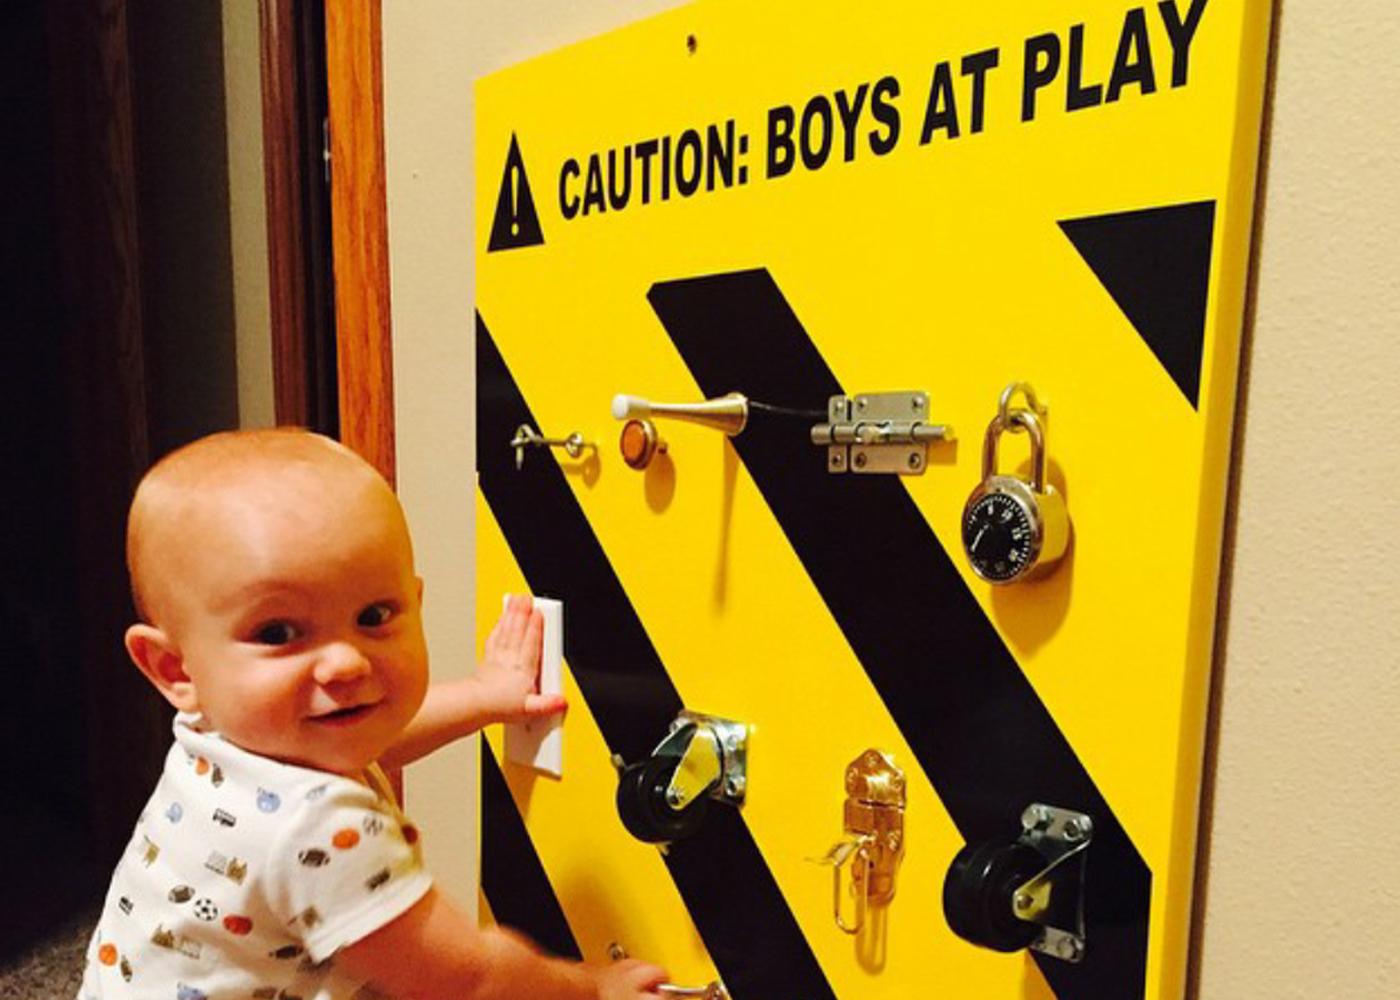 caution-boys-at-play-vinyl-decal-on-board.jpg